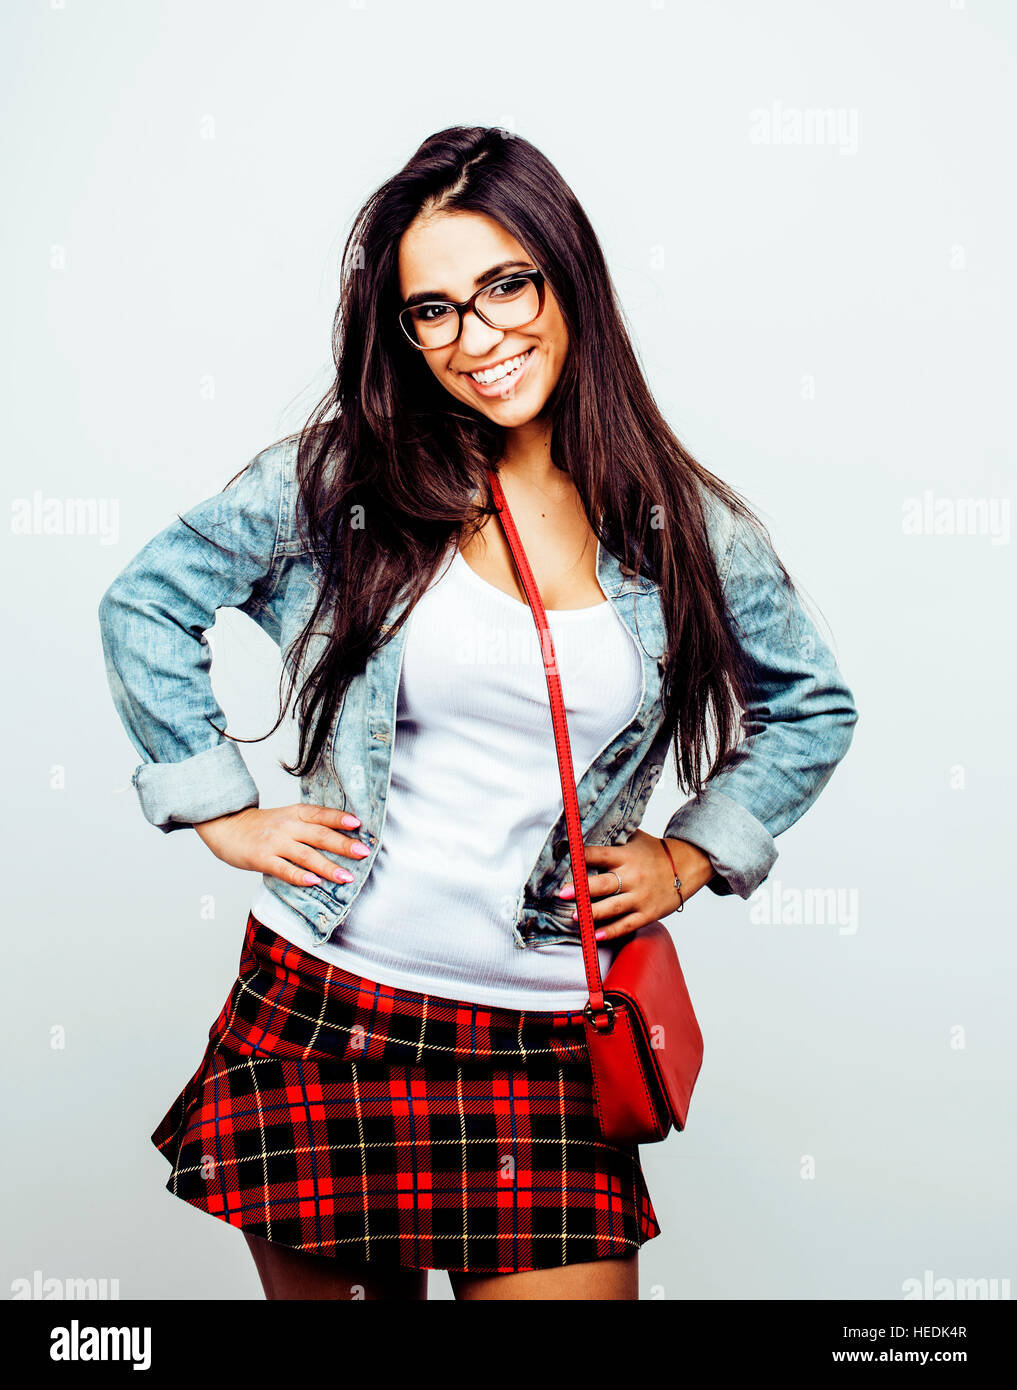 Young Happy Smiling Latin American Teenage Girl Emotional Posing On